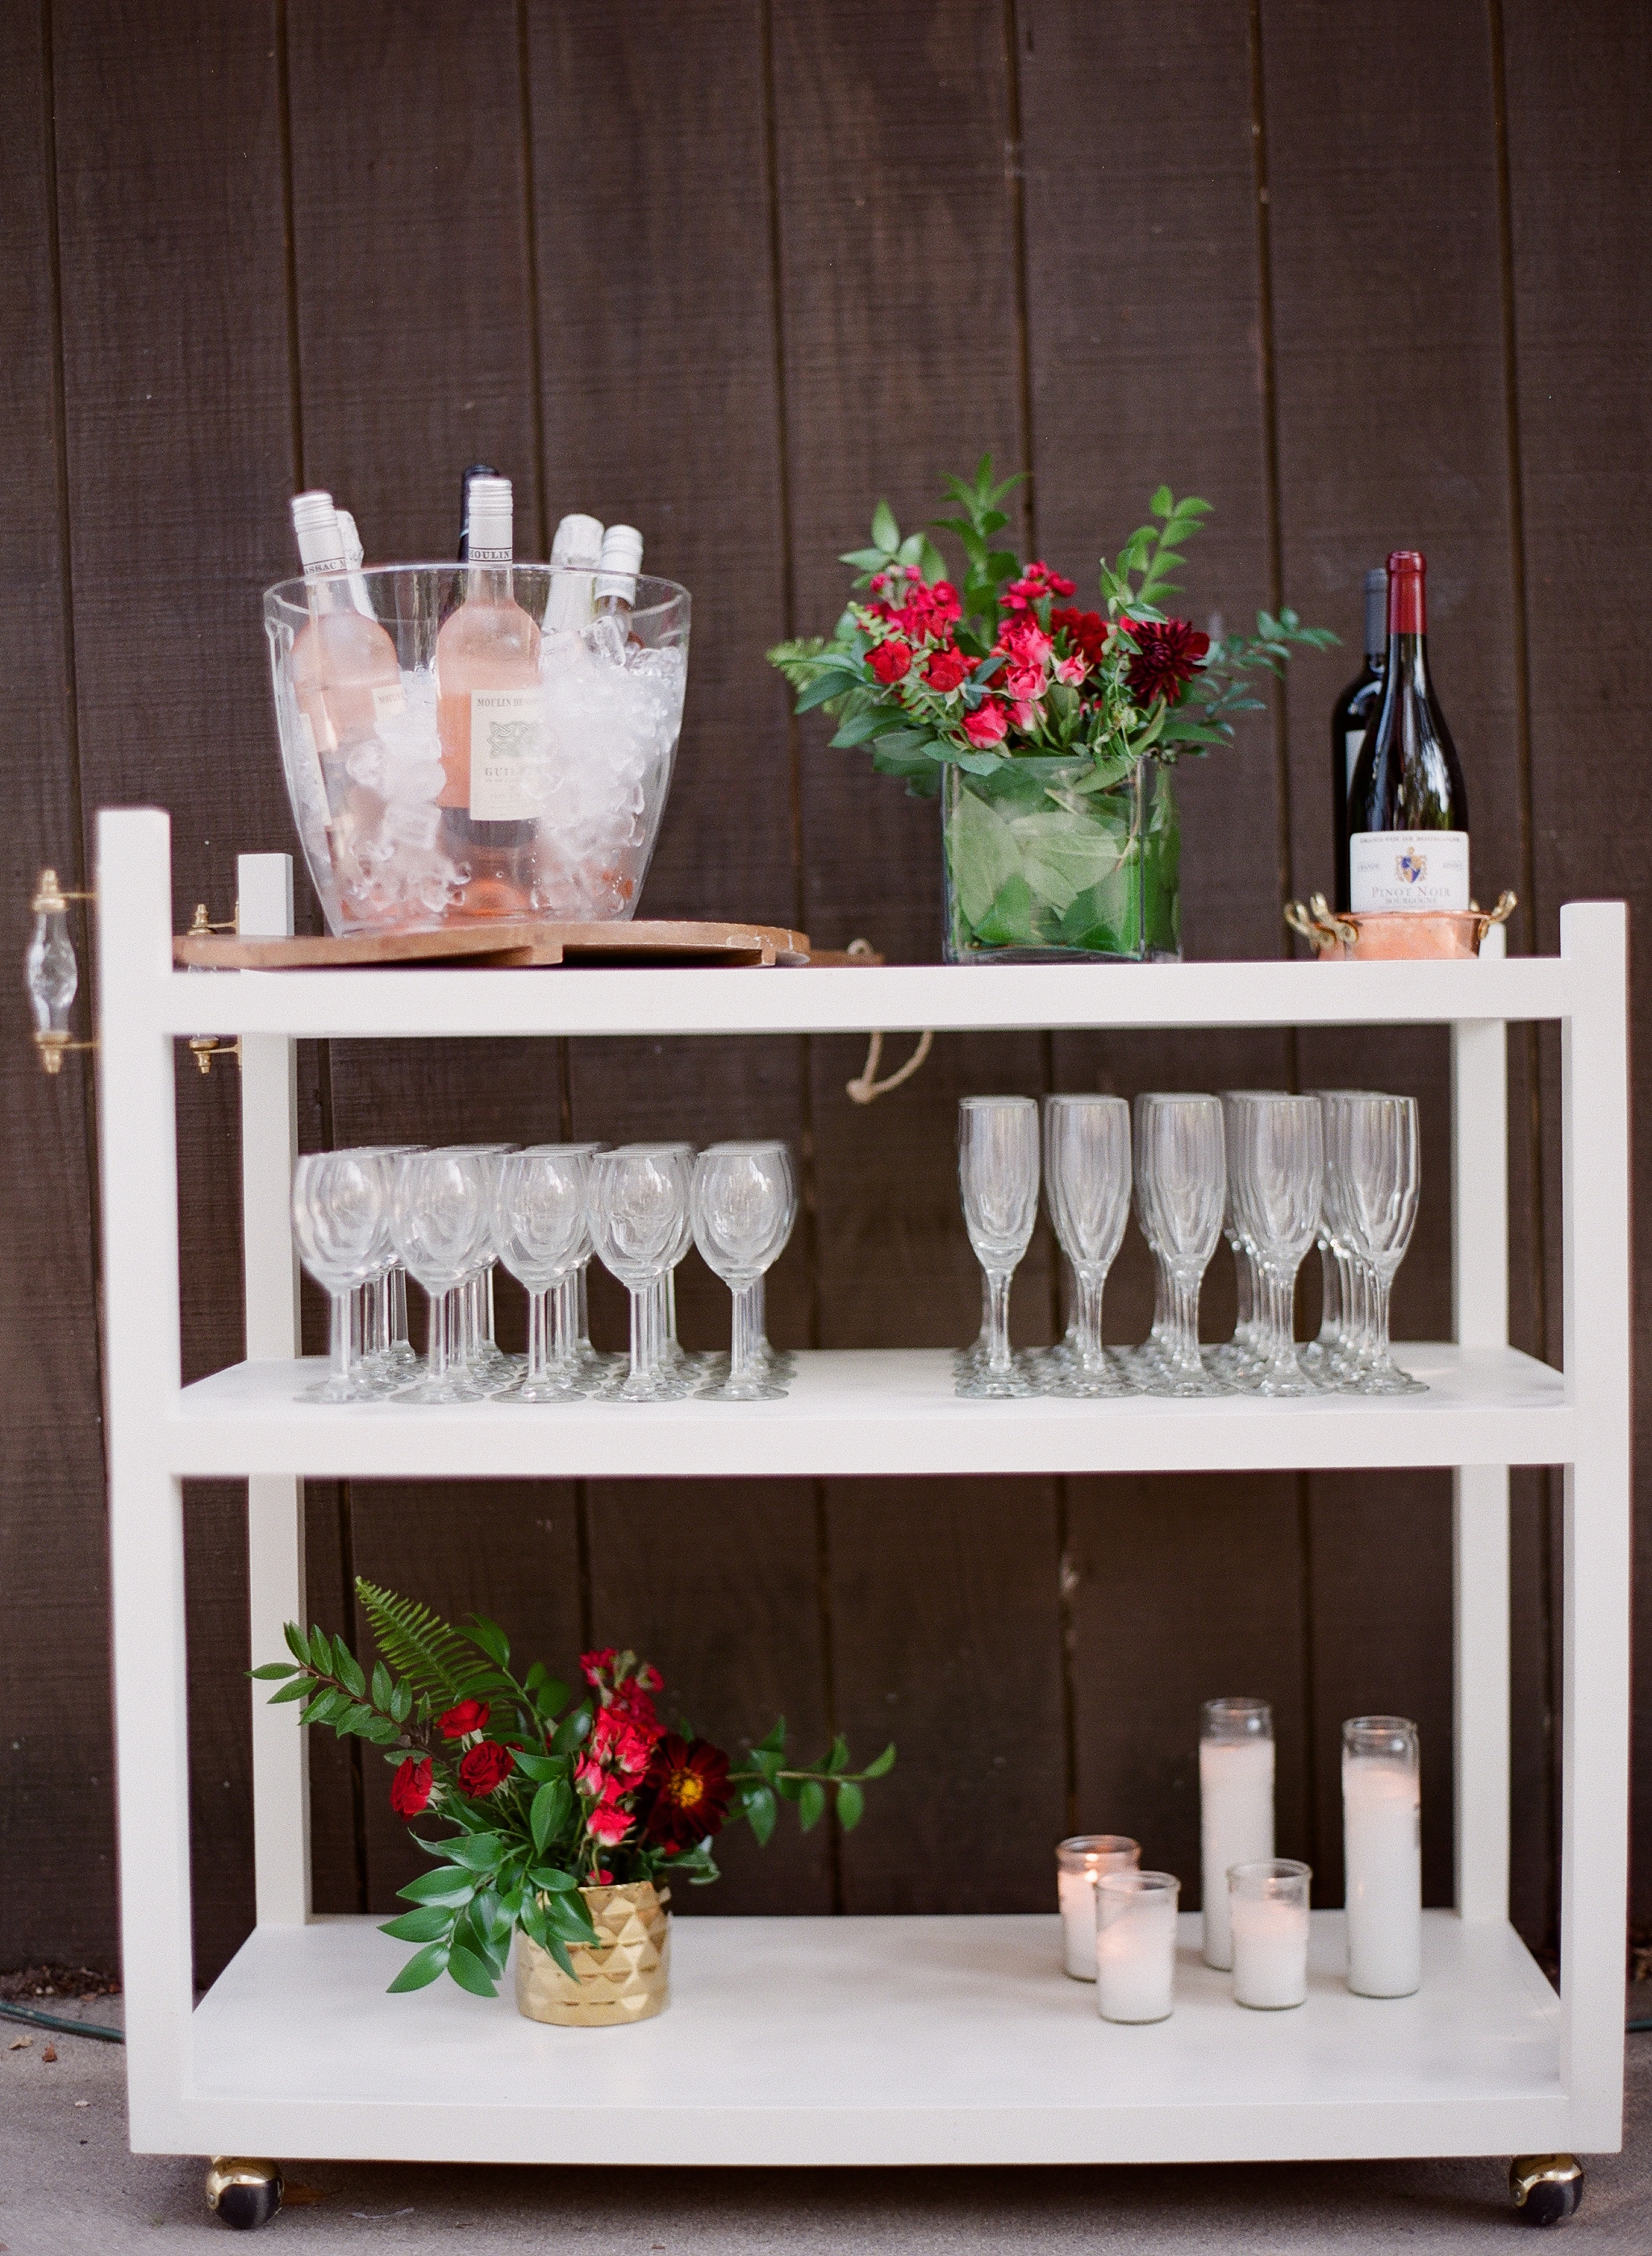 Al Fresco Bridal Shower - by Midtown Design & Events // photo by Megan Sorel